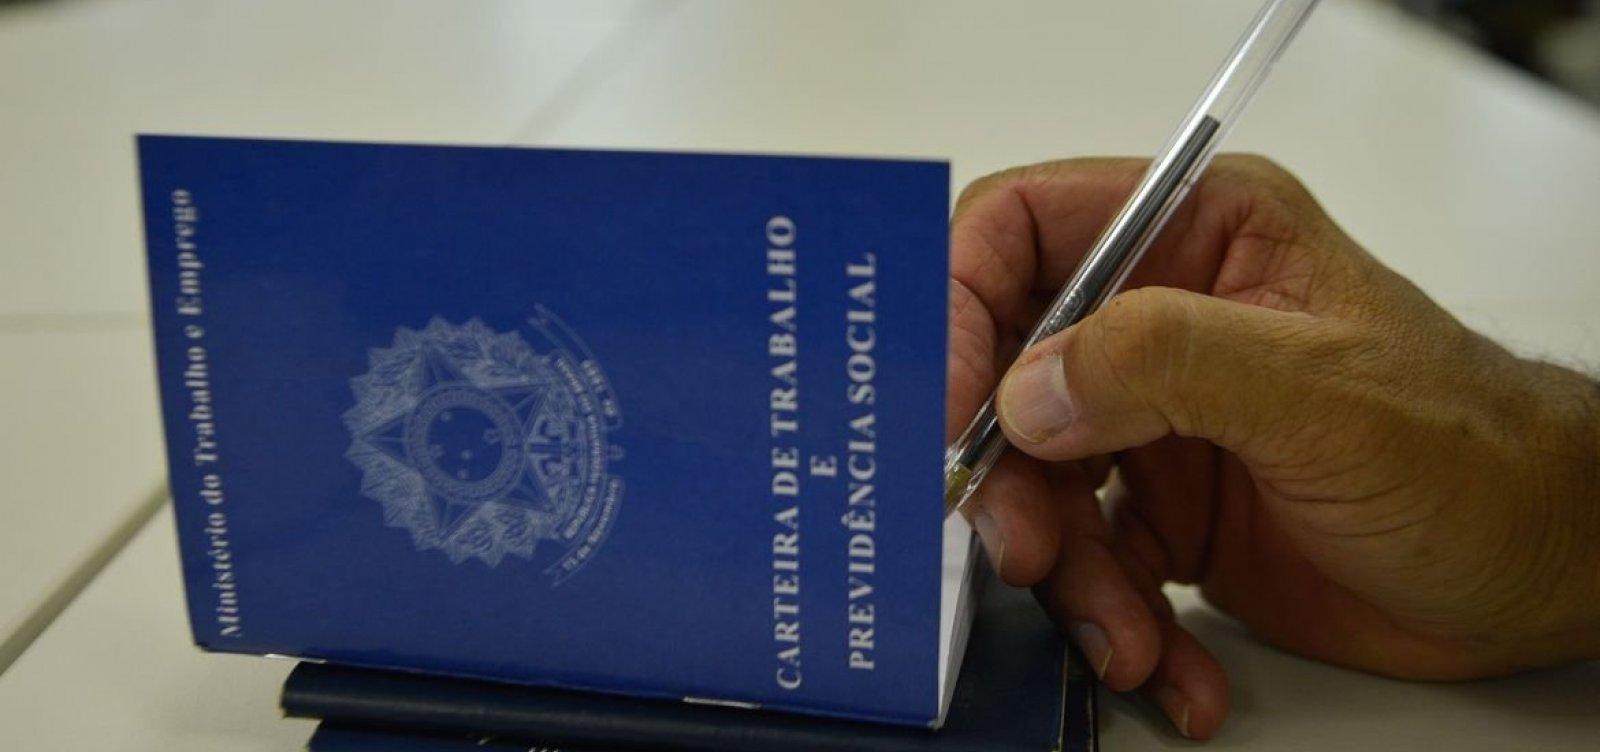 [Brasil tem 2,6 milhões de pedidos de seguro-desemprego durante pandemia]